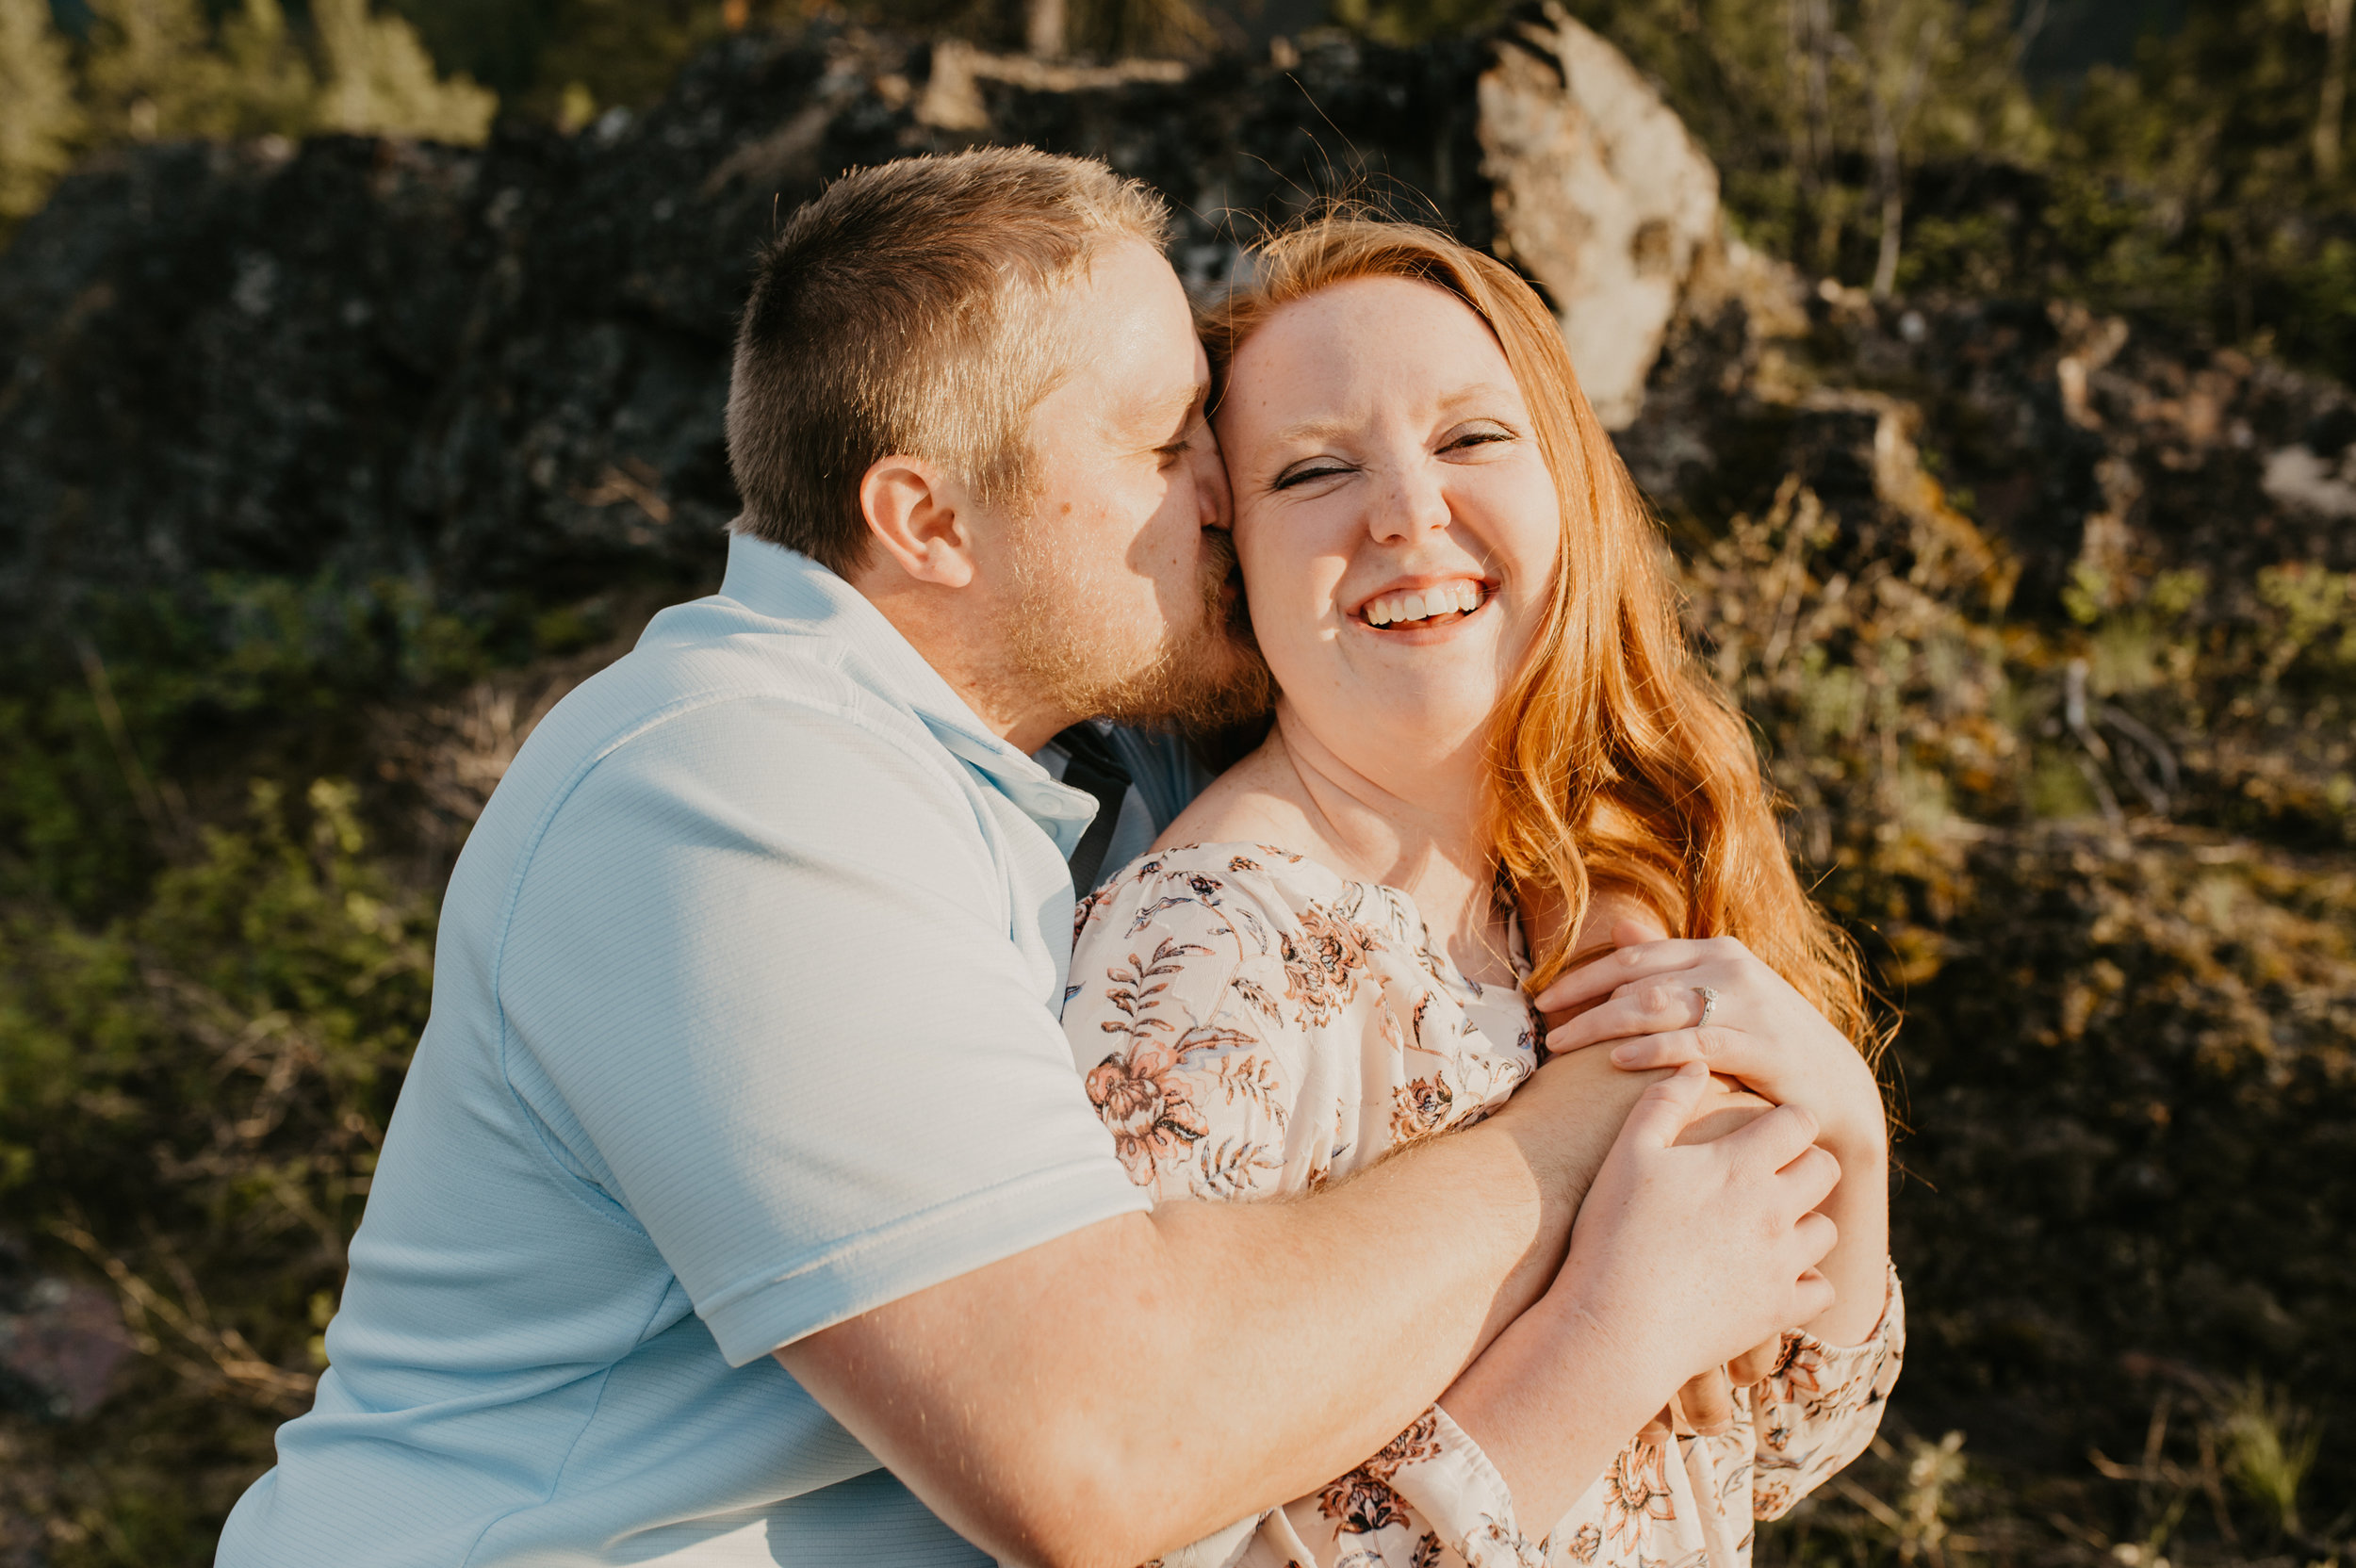 021White Raven Engagement Session_Megan & Justin_Honeybee Weddings_May 10, 2019-46.jpg